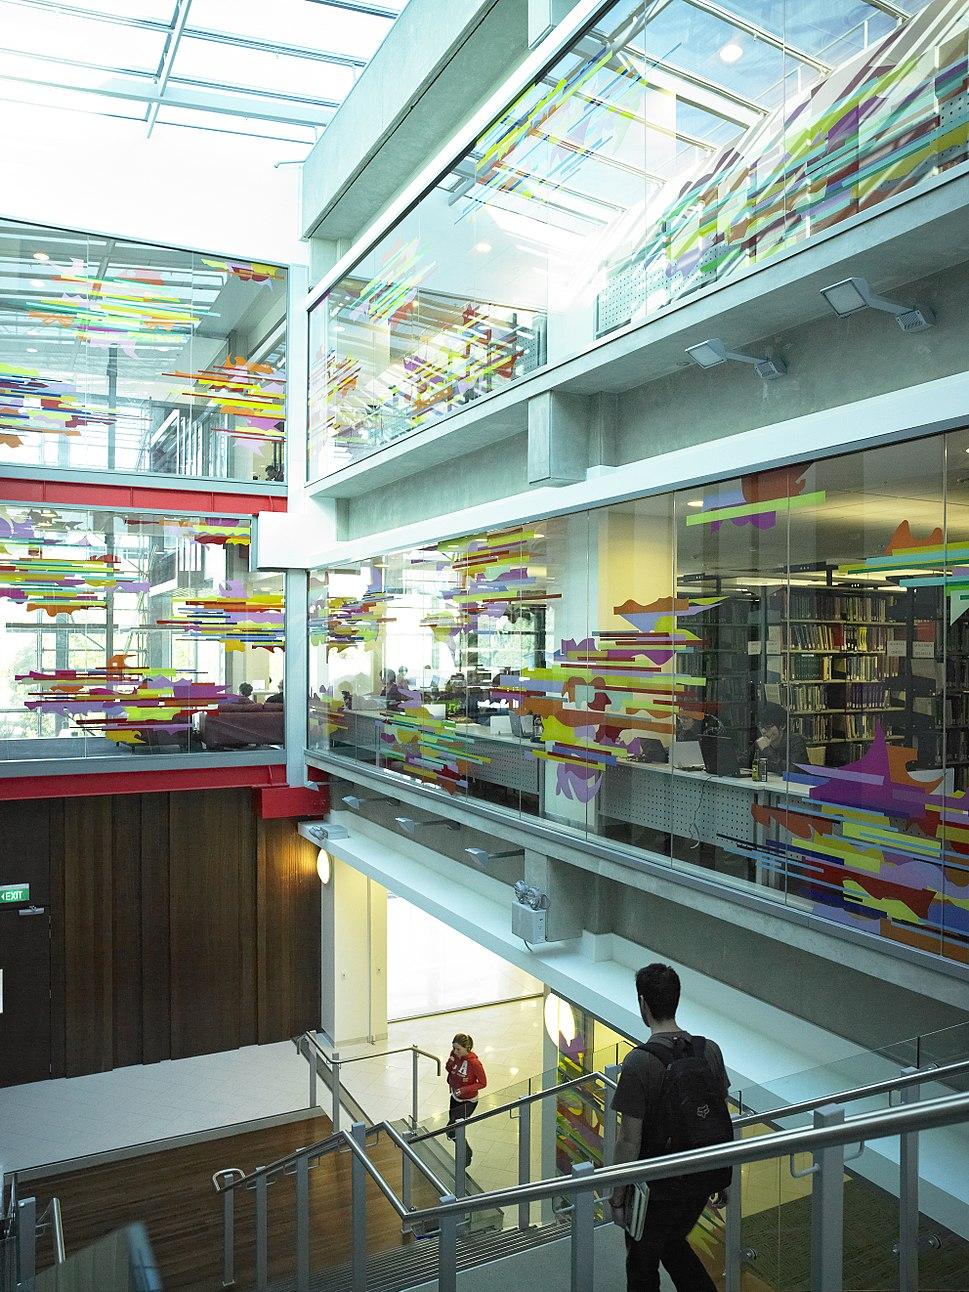 Inside the Waikato University Student Centre